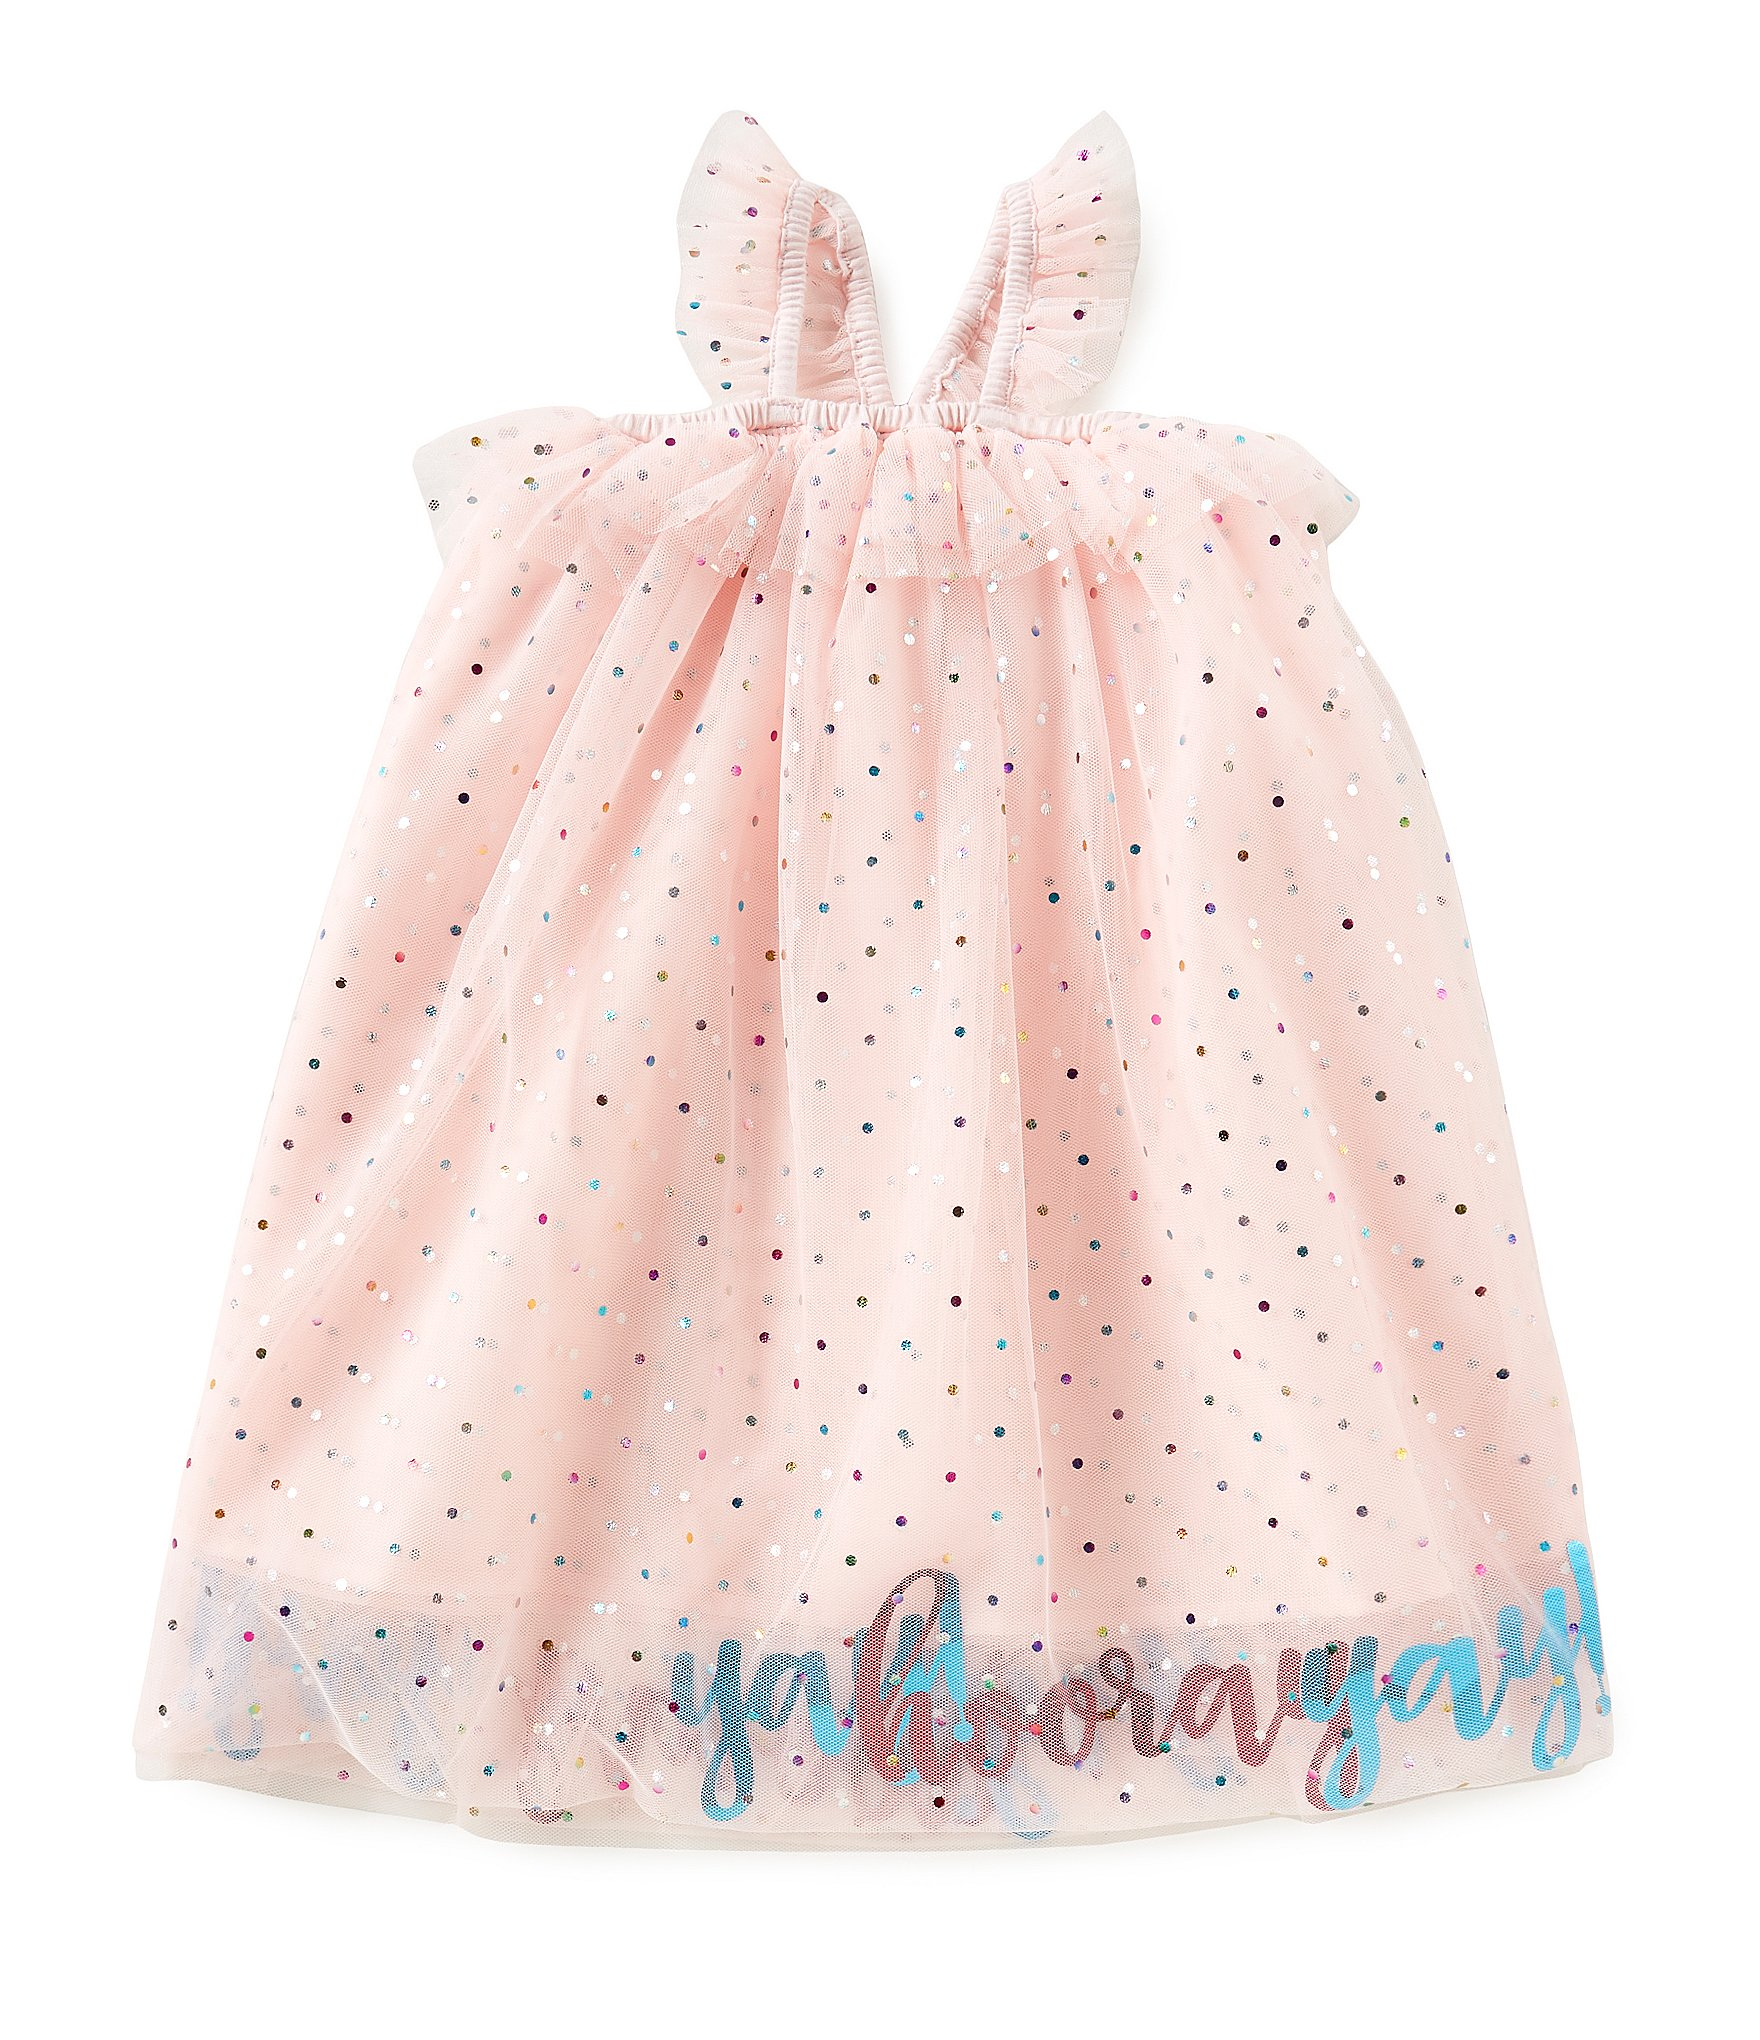 8911482f4df Mud Pie Baby Girls Yay Hooray Mesh Party Dress